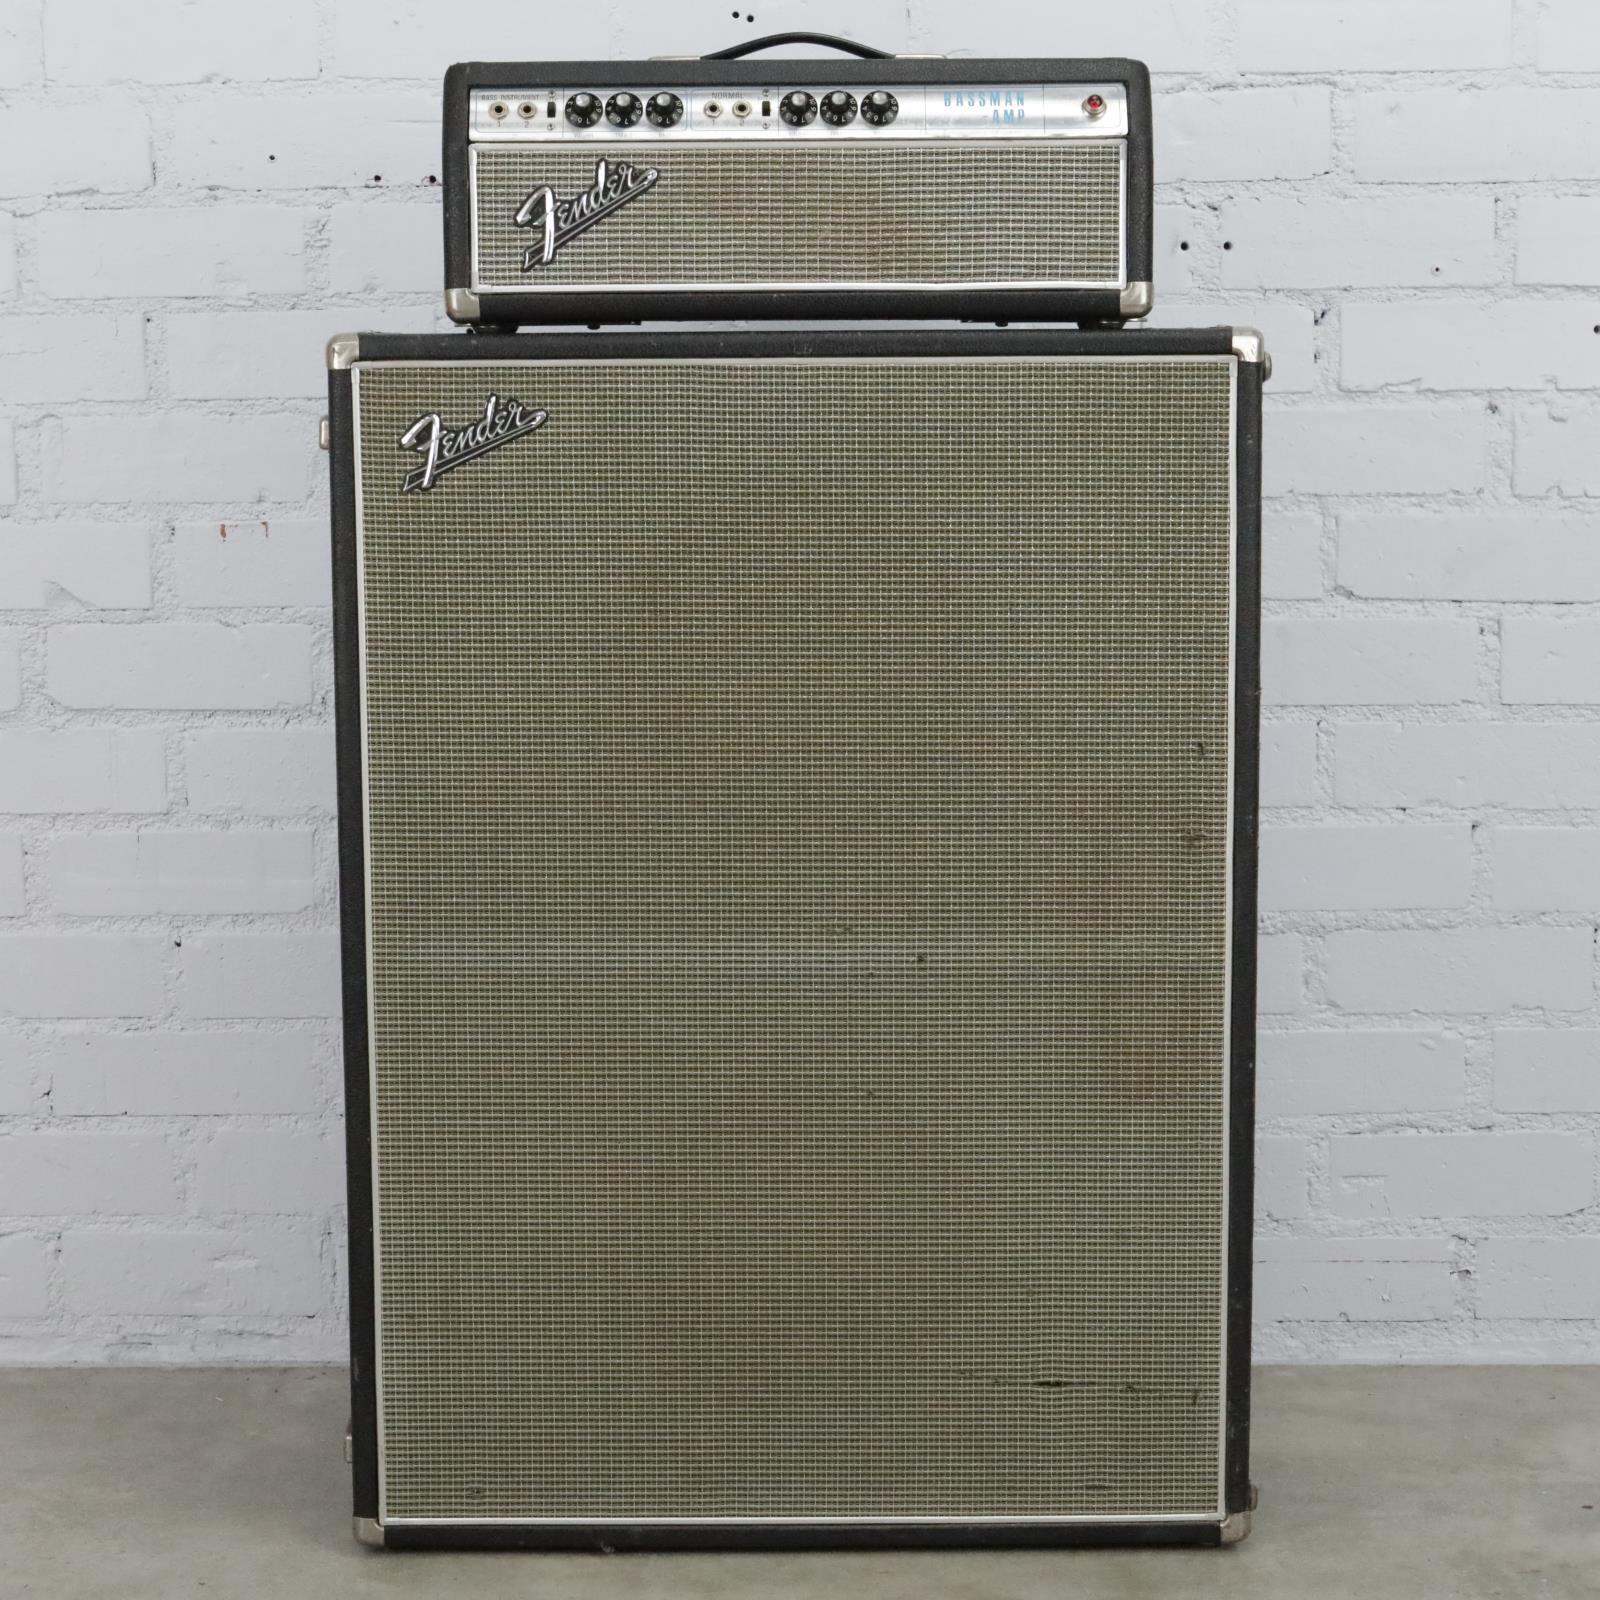 1968 Fender Bassman Amp Head & 2x15 Speaker Cabinet Guitar Bass Cab #40104